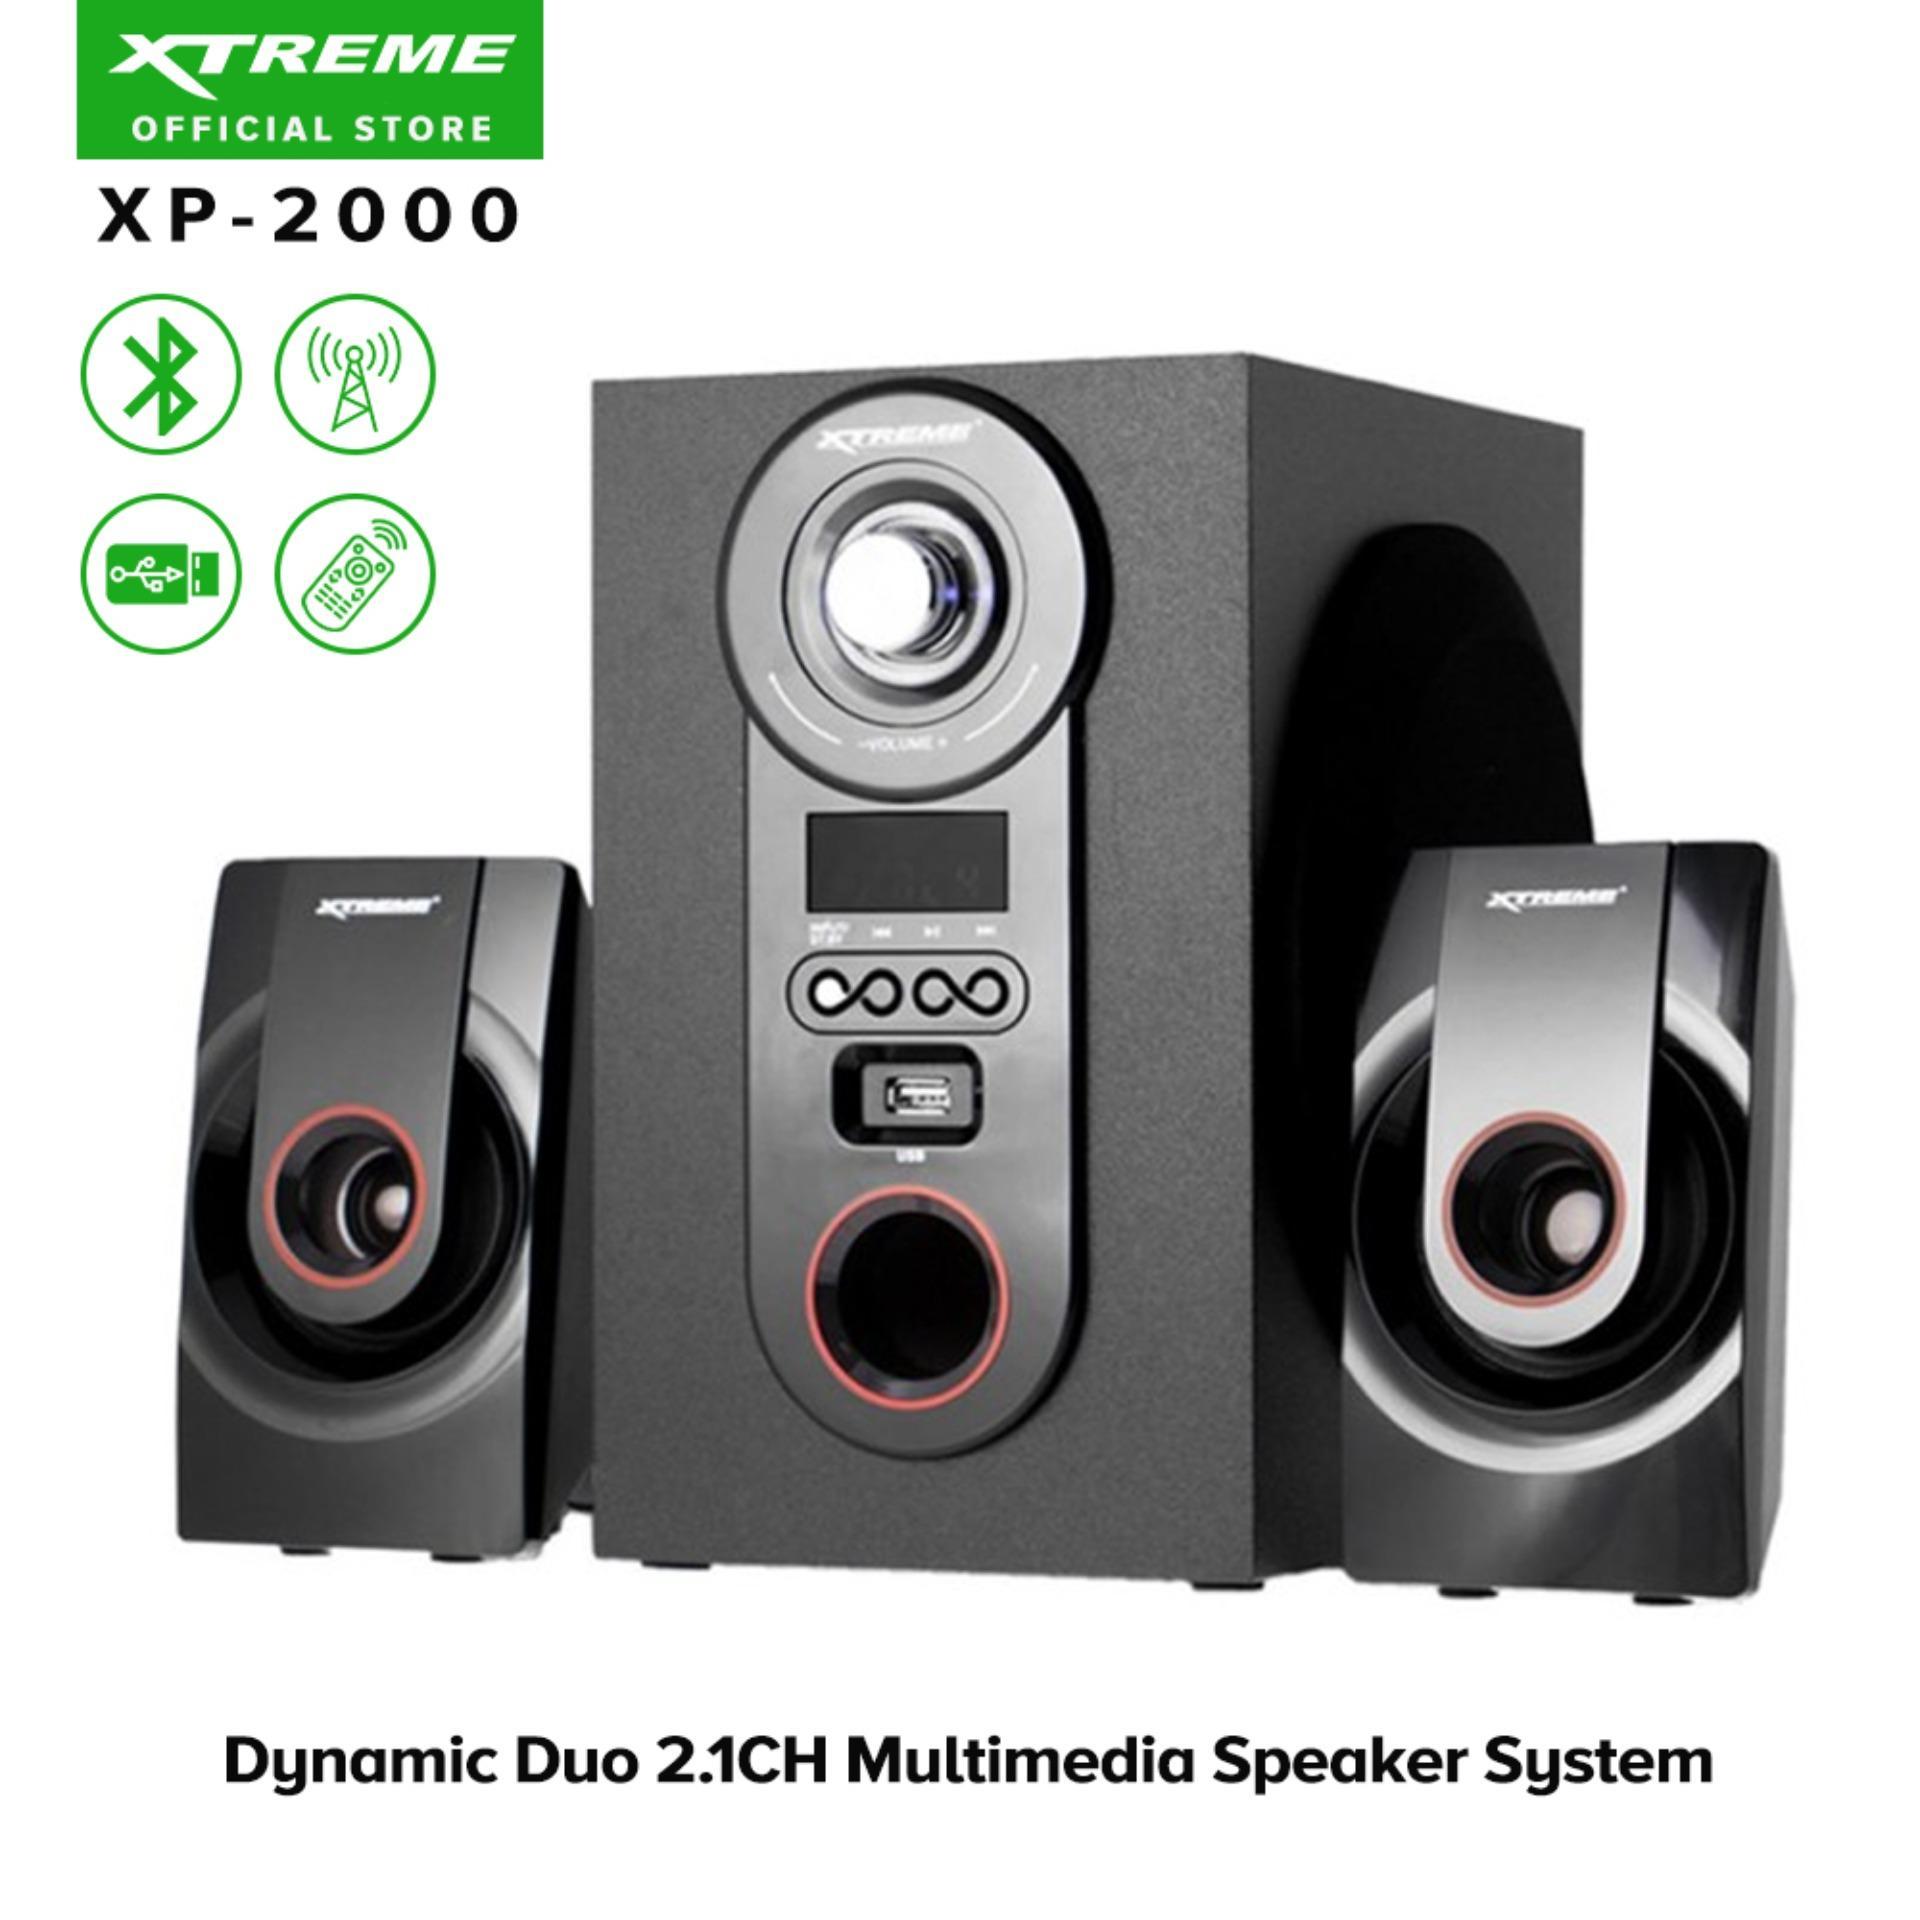 XTREME XP-2000 Dynamic Duo 2 1CH Multimedia Speaker System (Black)